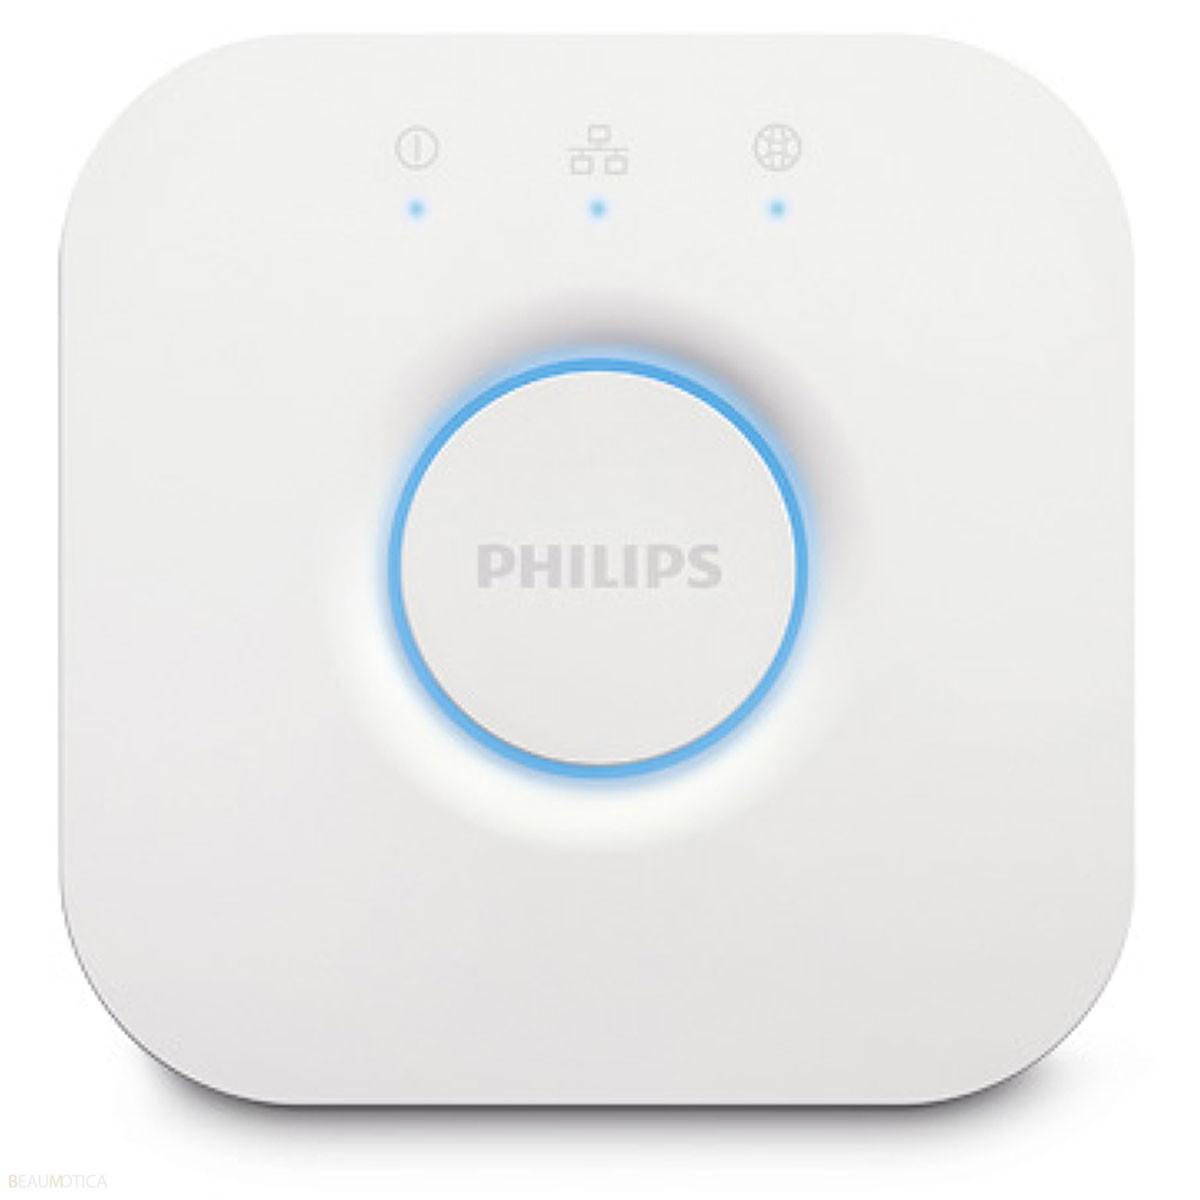 philips hue white ambiance starterpack met 2 led e27 lampen bridge en dimmer review iot. Black Bedroom Furniture Sets. Home Design Ideas